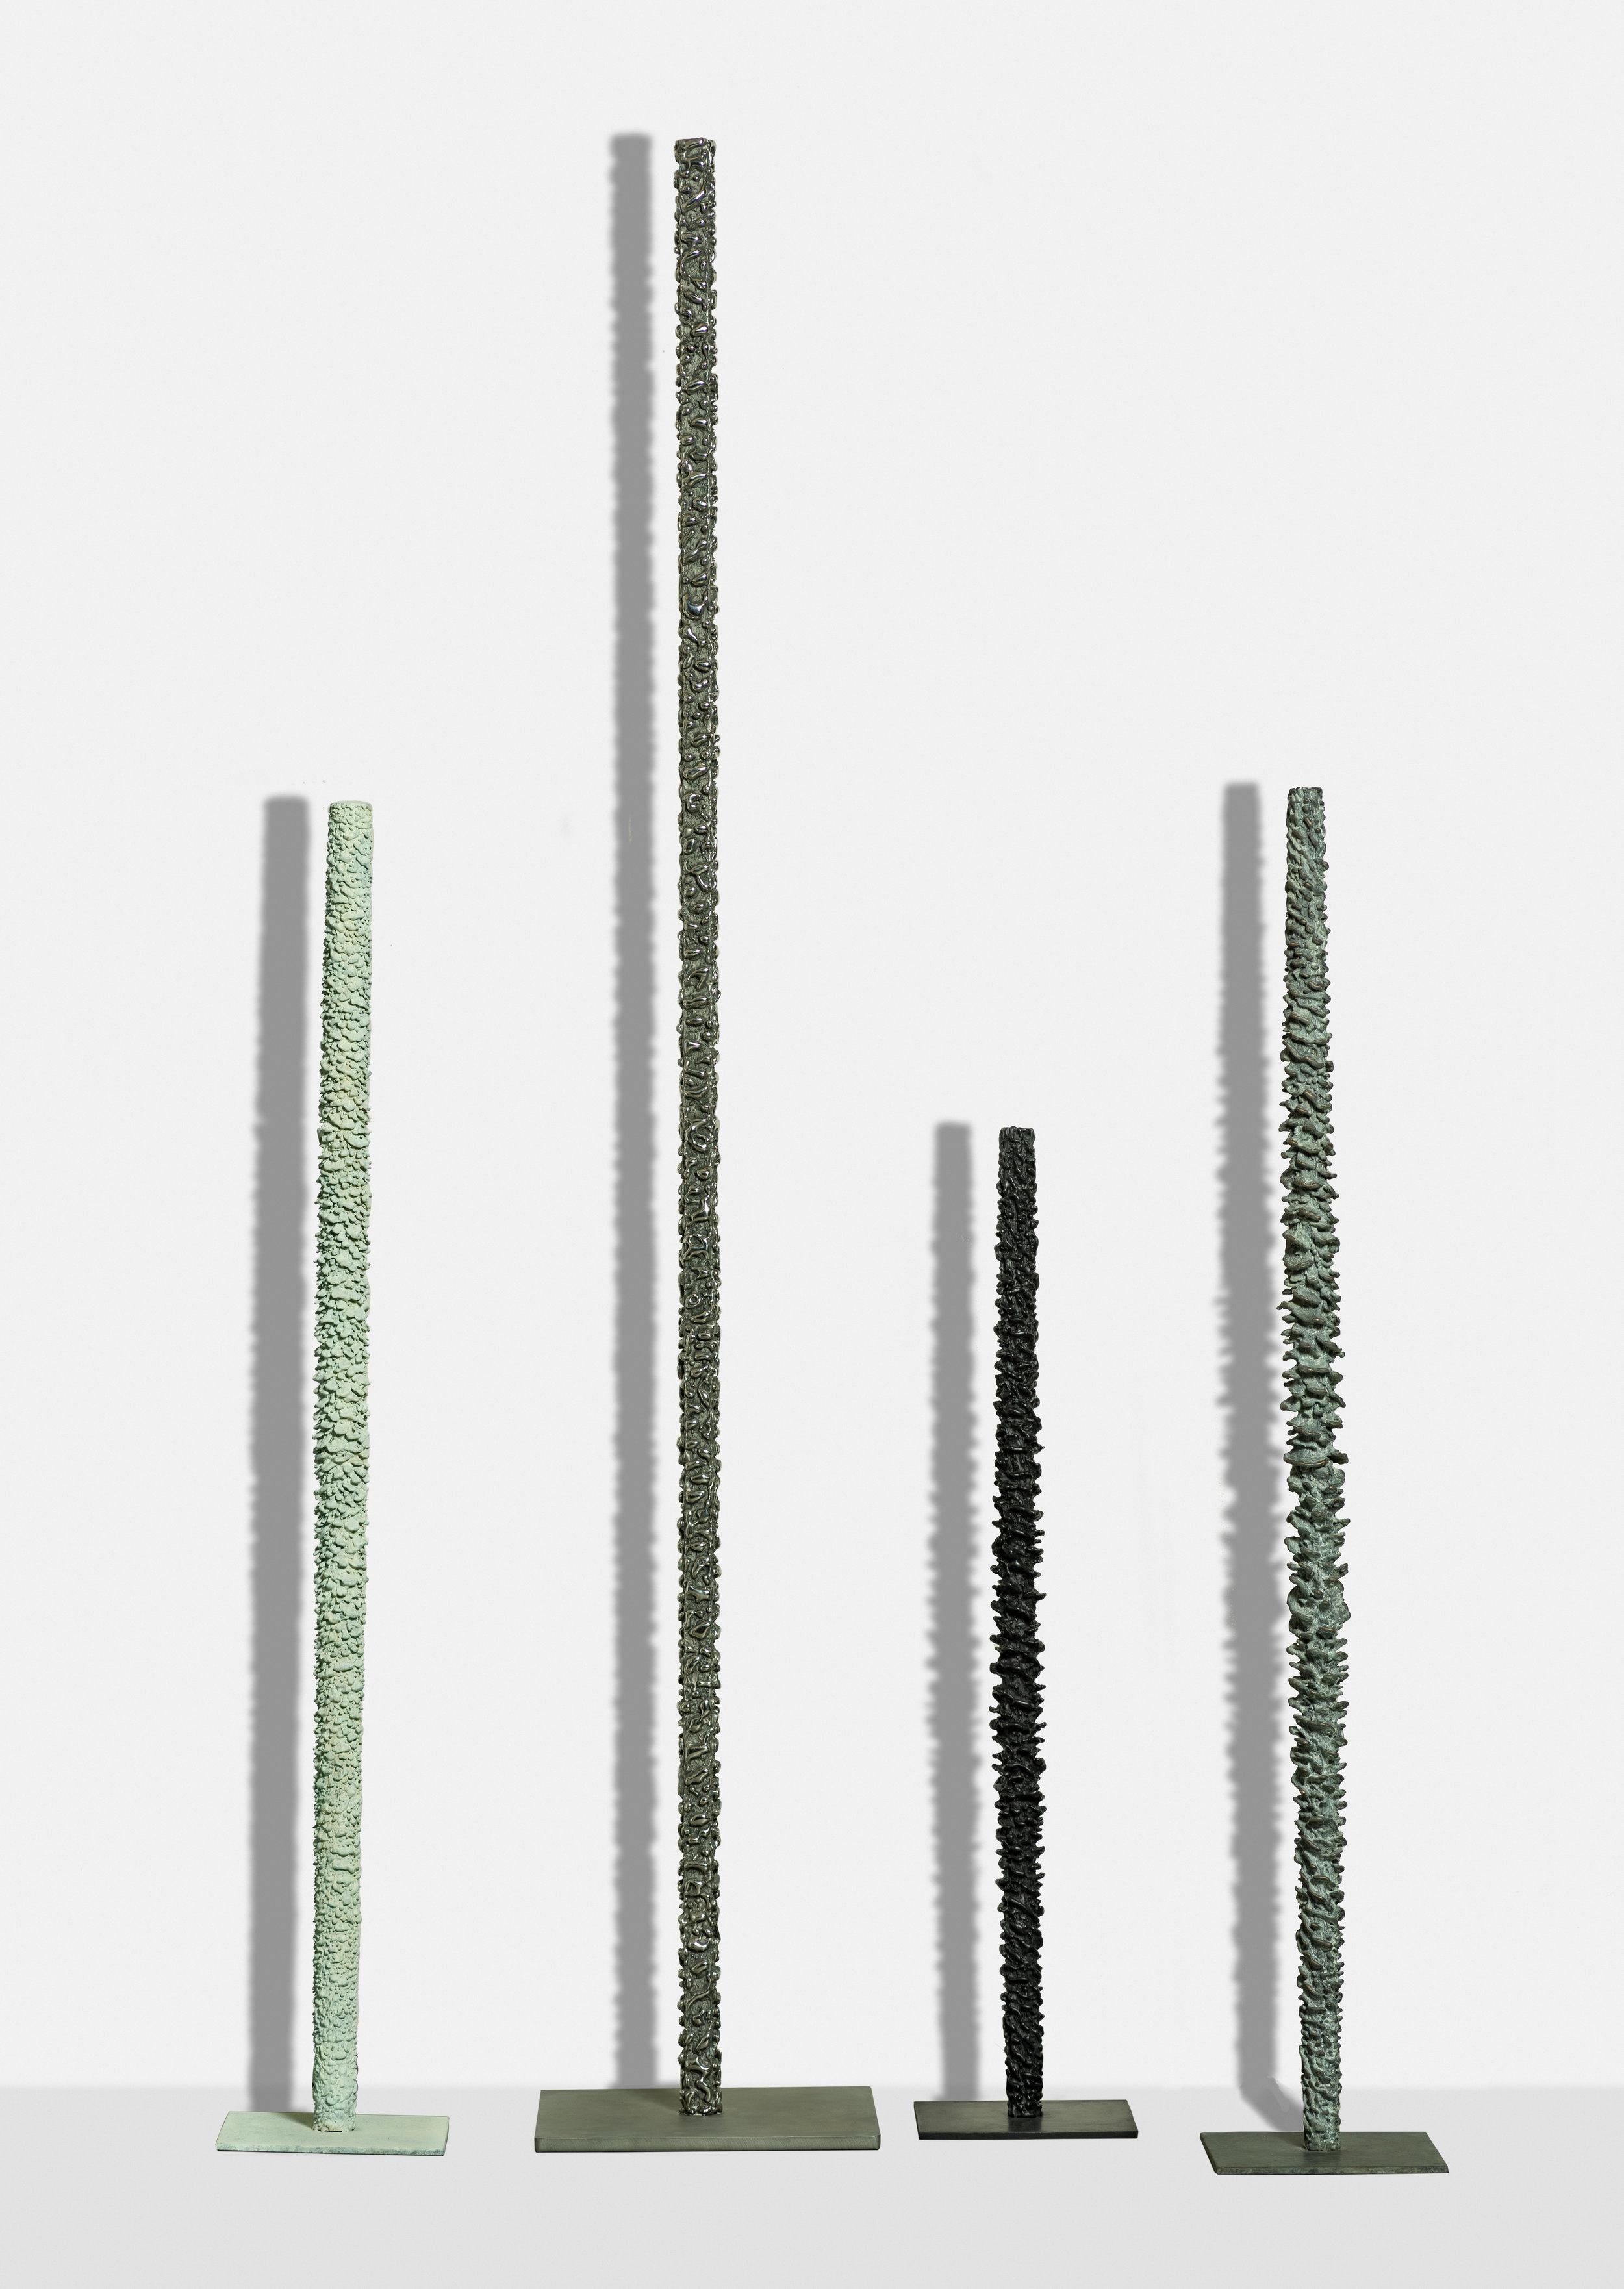 White Totem (I),  2017, bronze (unique cast), 36 x 7 7/8 x 7 7/8 inches   Stainless Totem ,   2017, bronze (unique cast), 71 1/2 x 12 1/8 x 12 1/8 inches   Black Spiral,  2017, bronze (unique cast), 36 x 7 3/4 x 7 3/4inches   Grey Spiral , 2017, bronze (unique cast), 48 x 7 7/8 x 7 7/8 inches